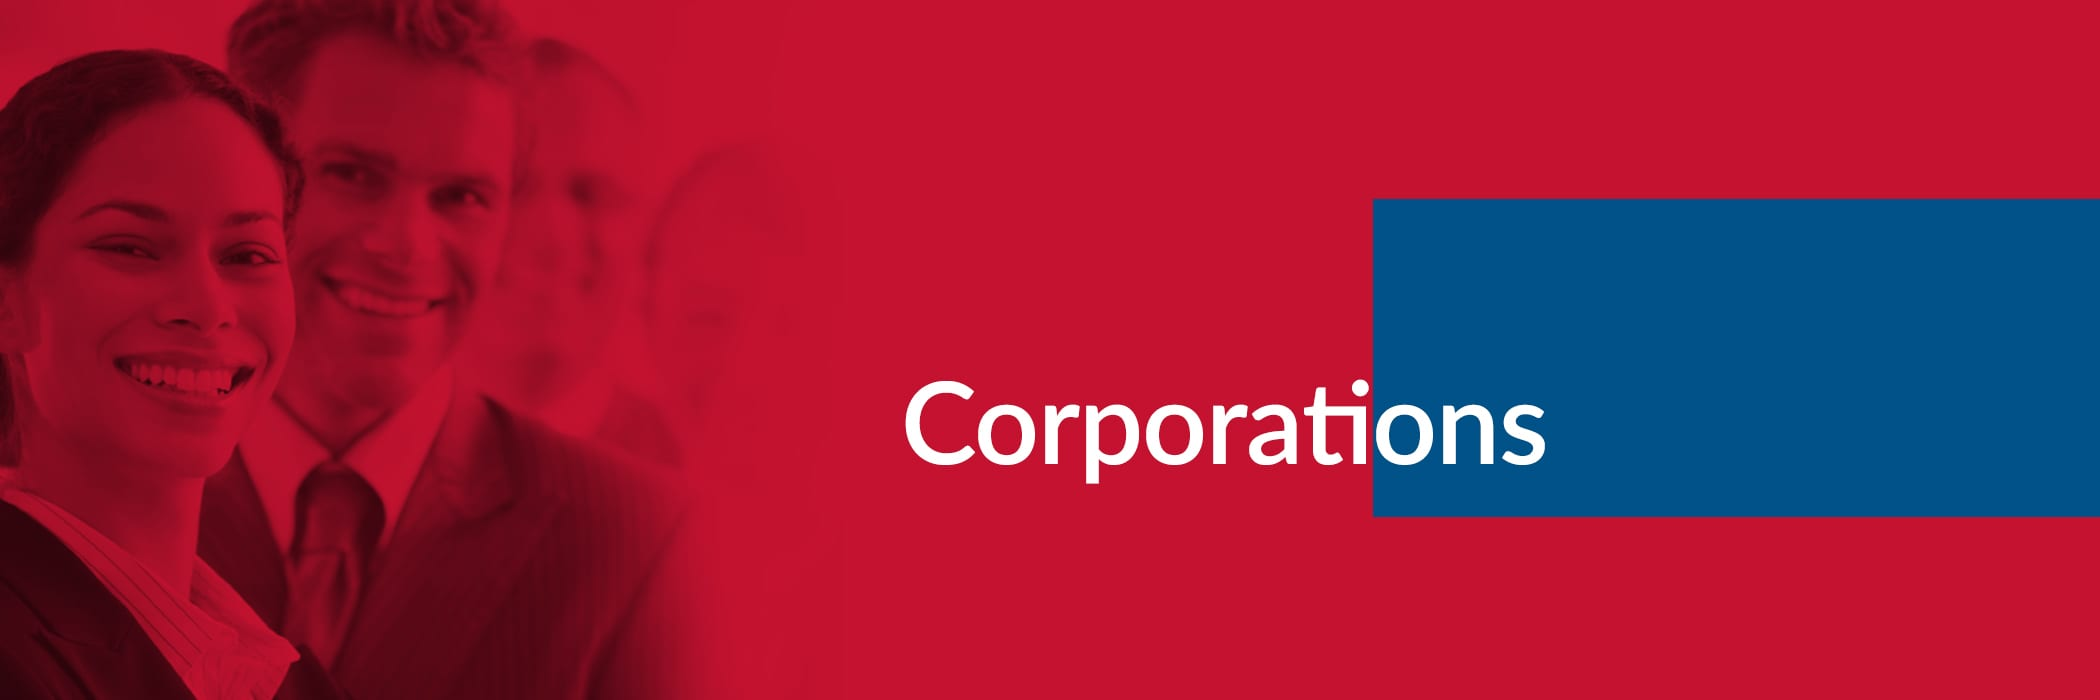 Corporatios